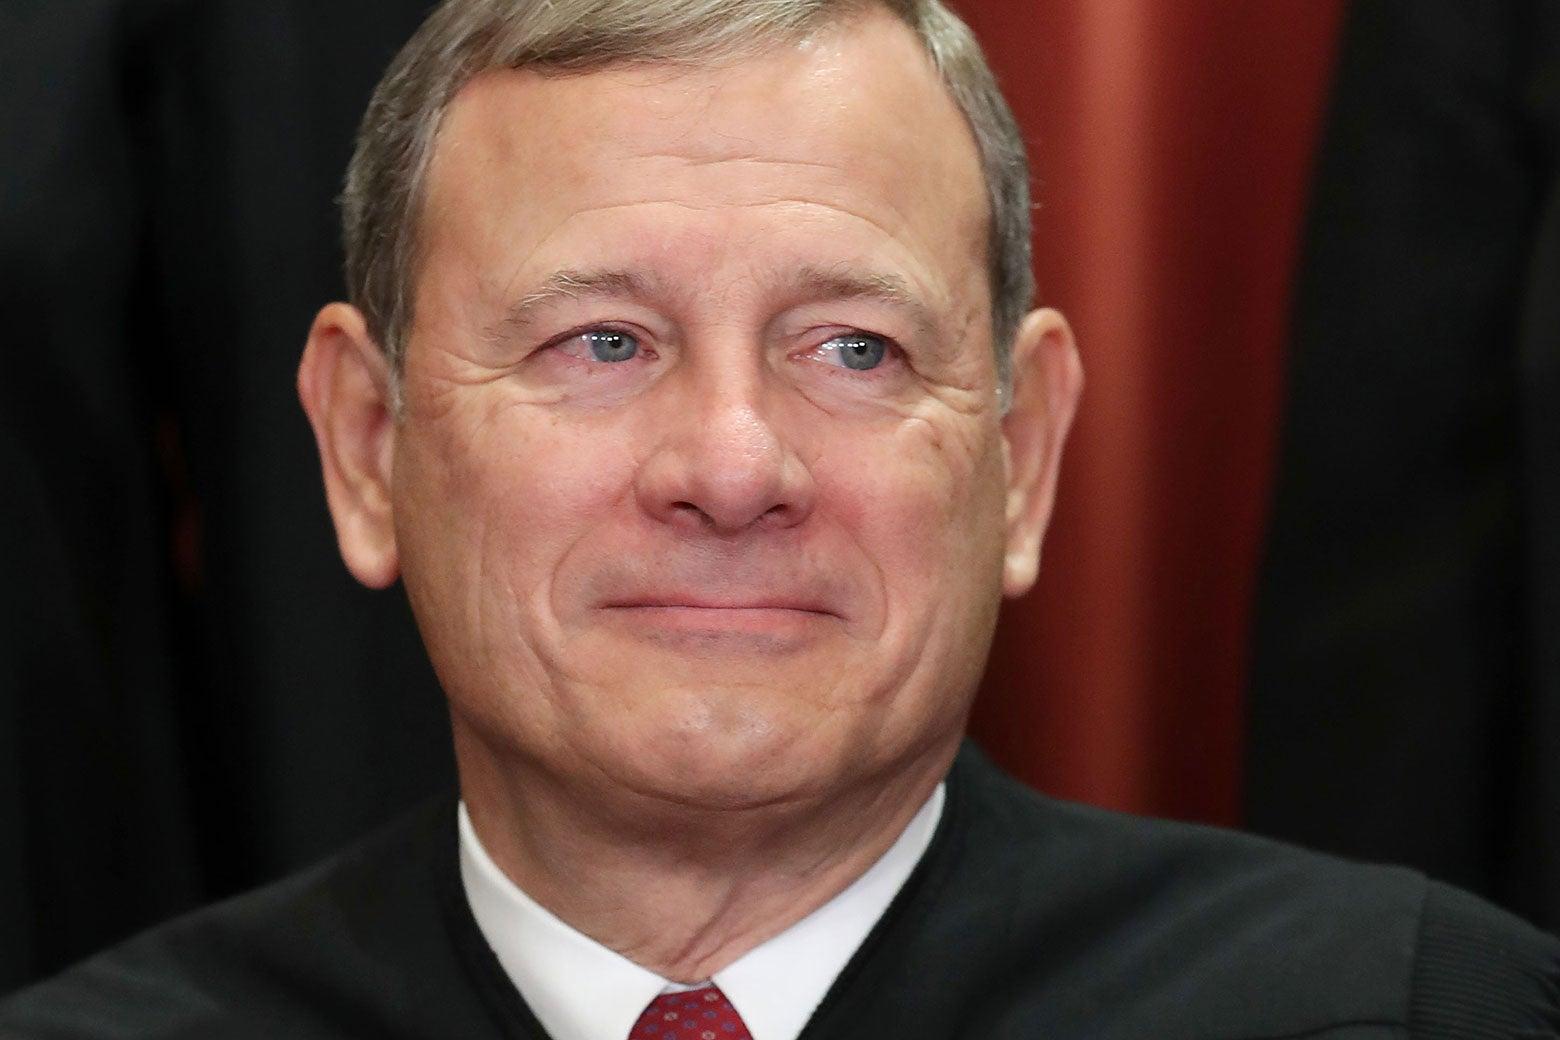 John Roberts in his robes, smiling.